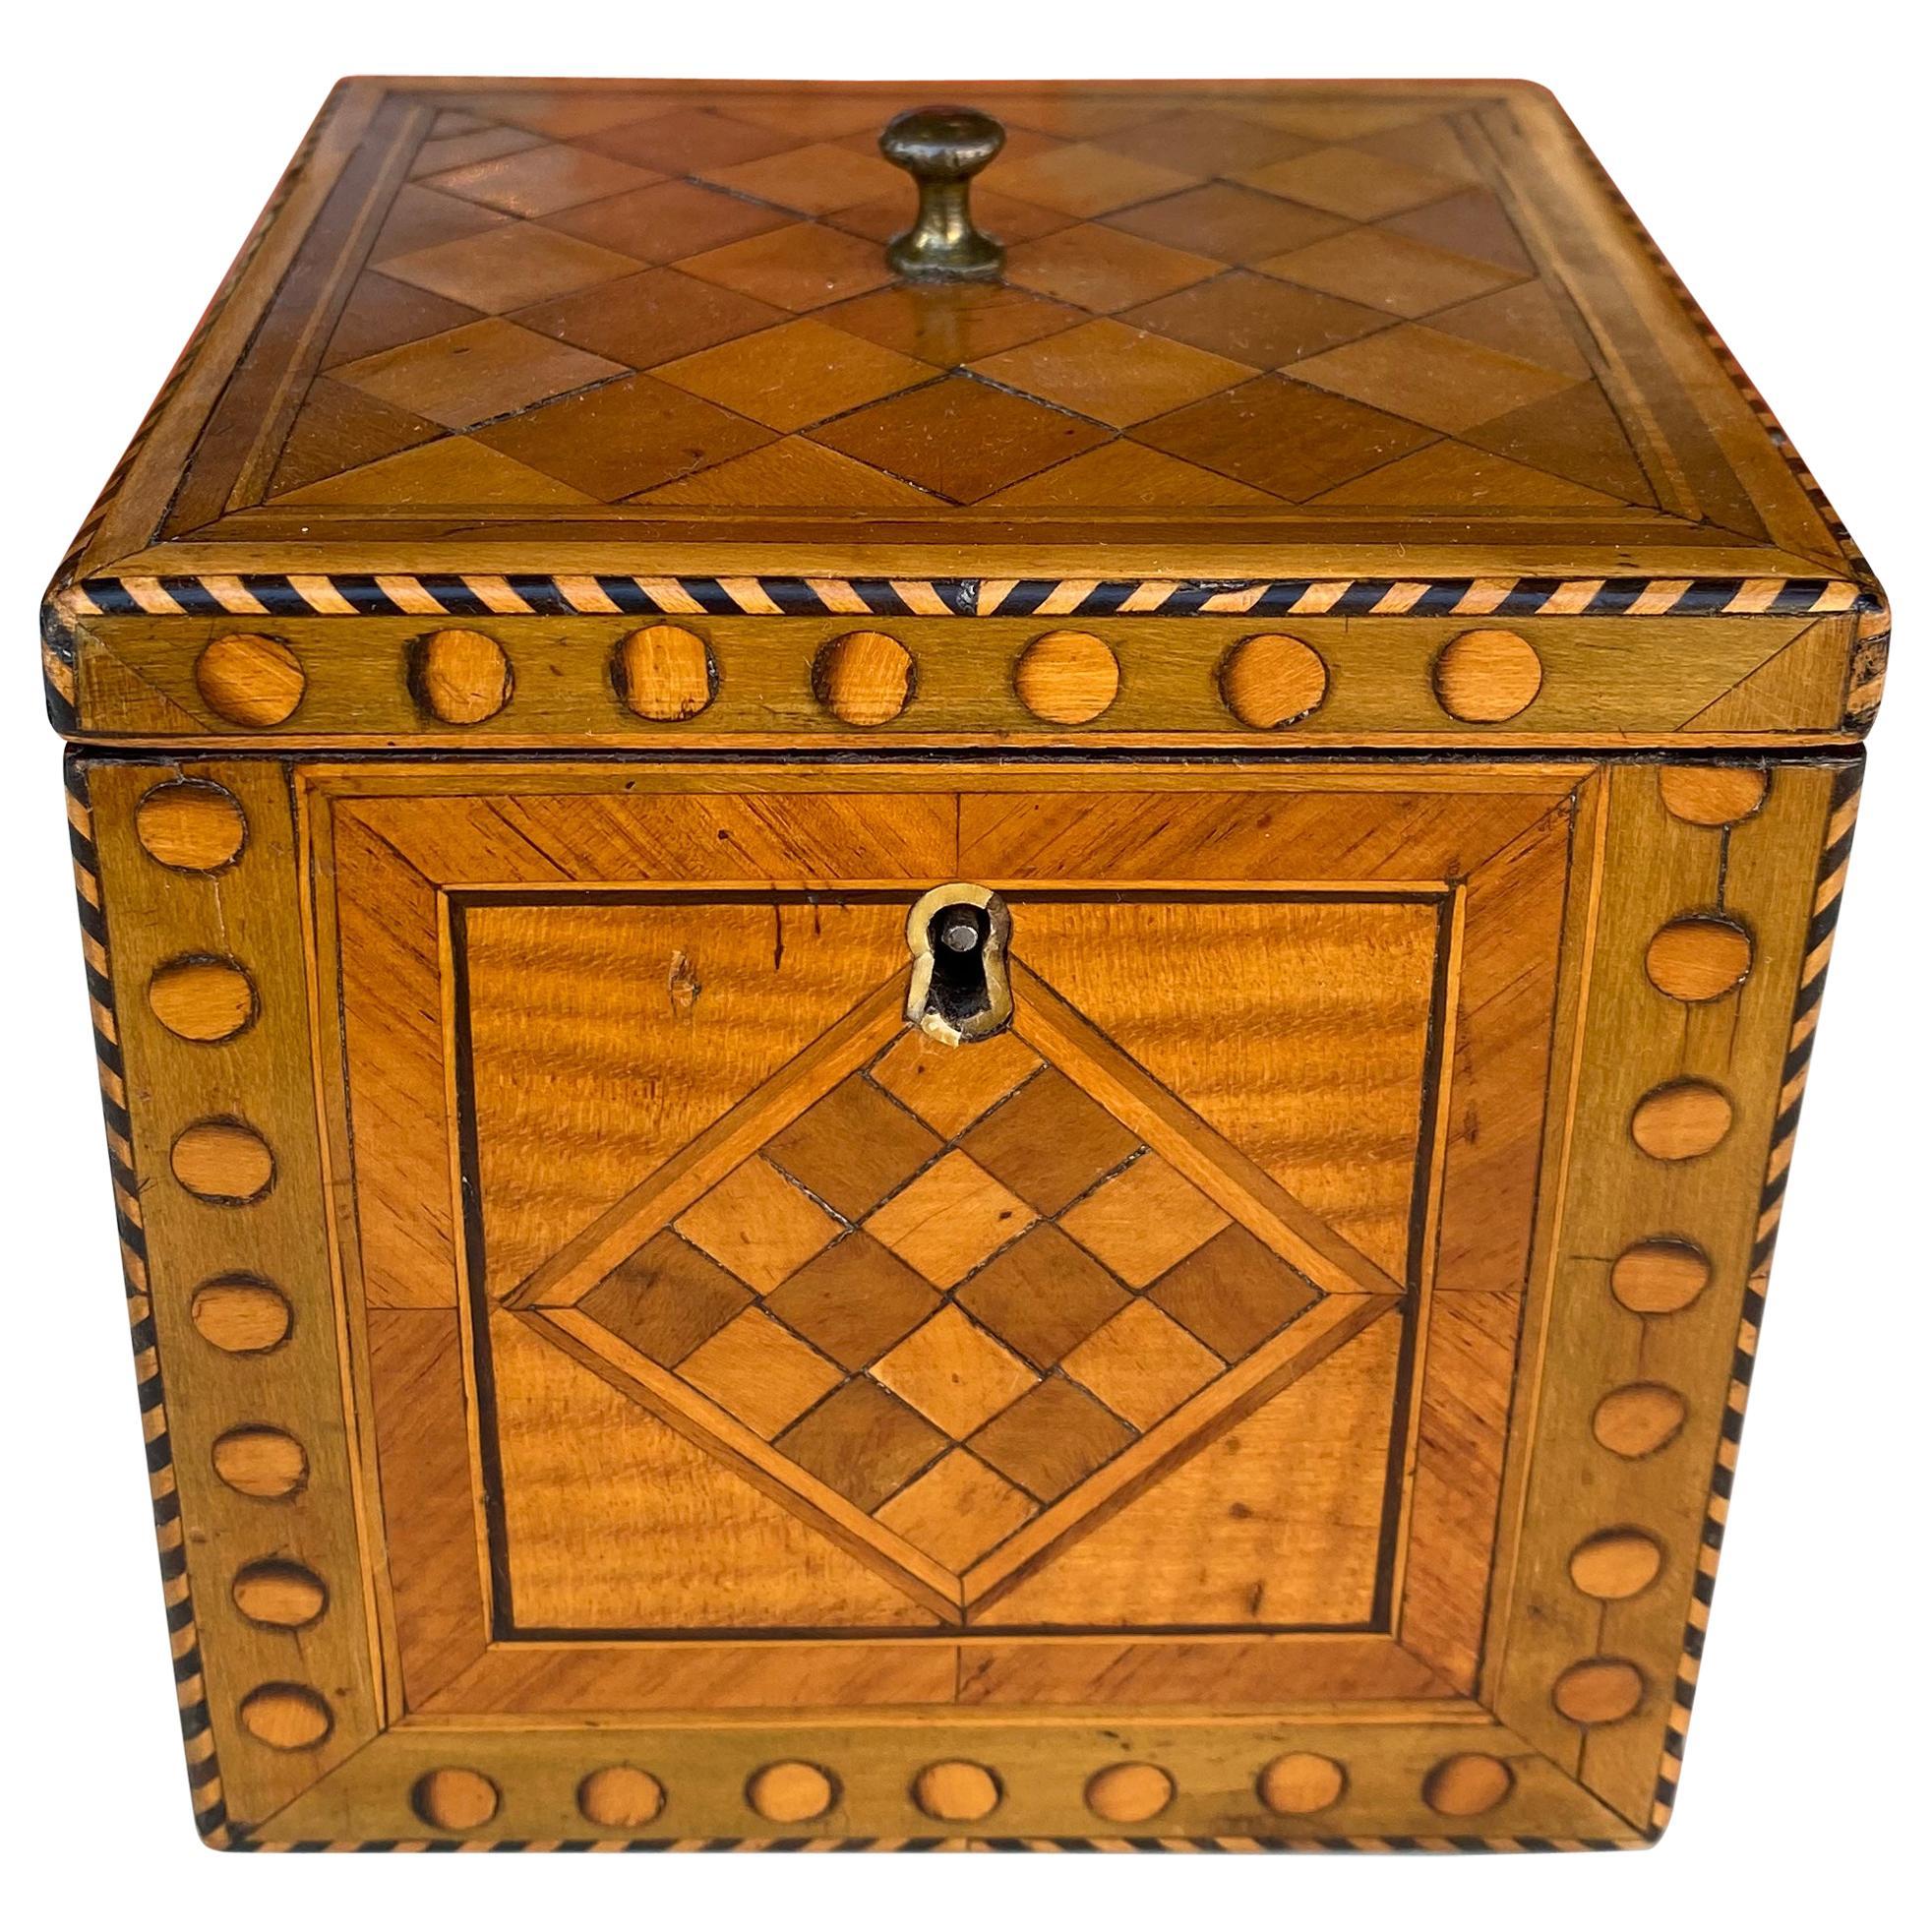 Satinwood inlaid cube tea caddy